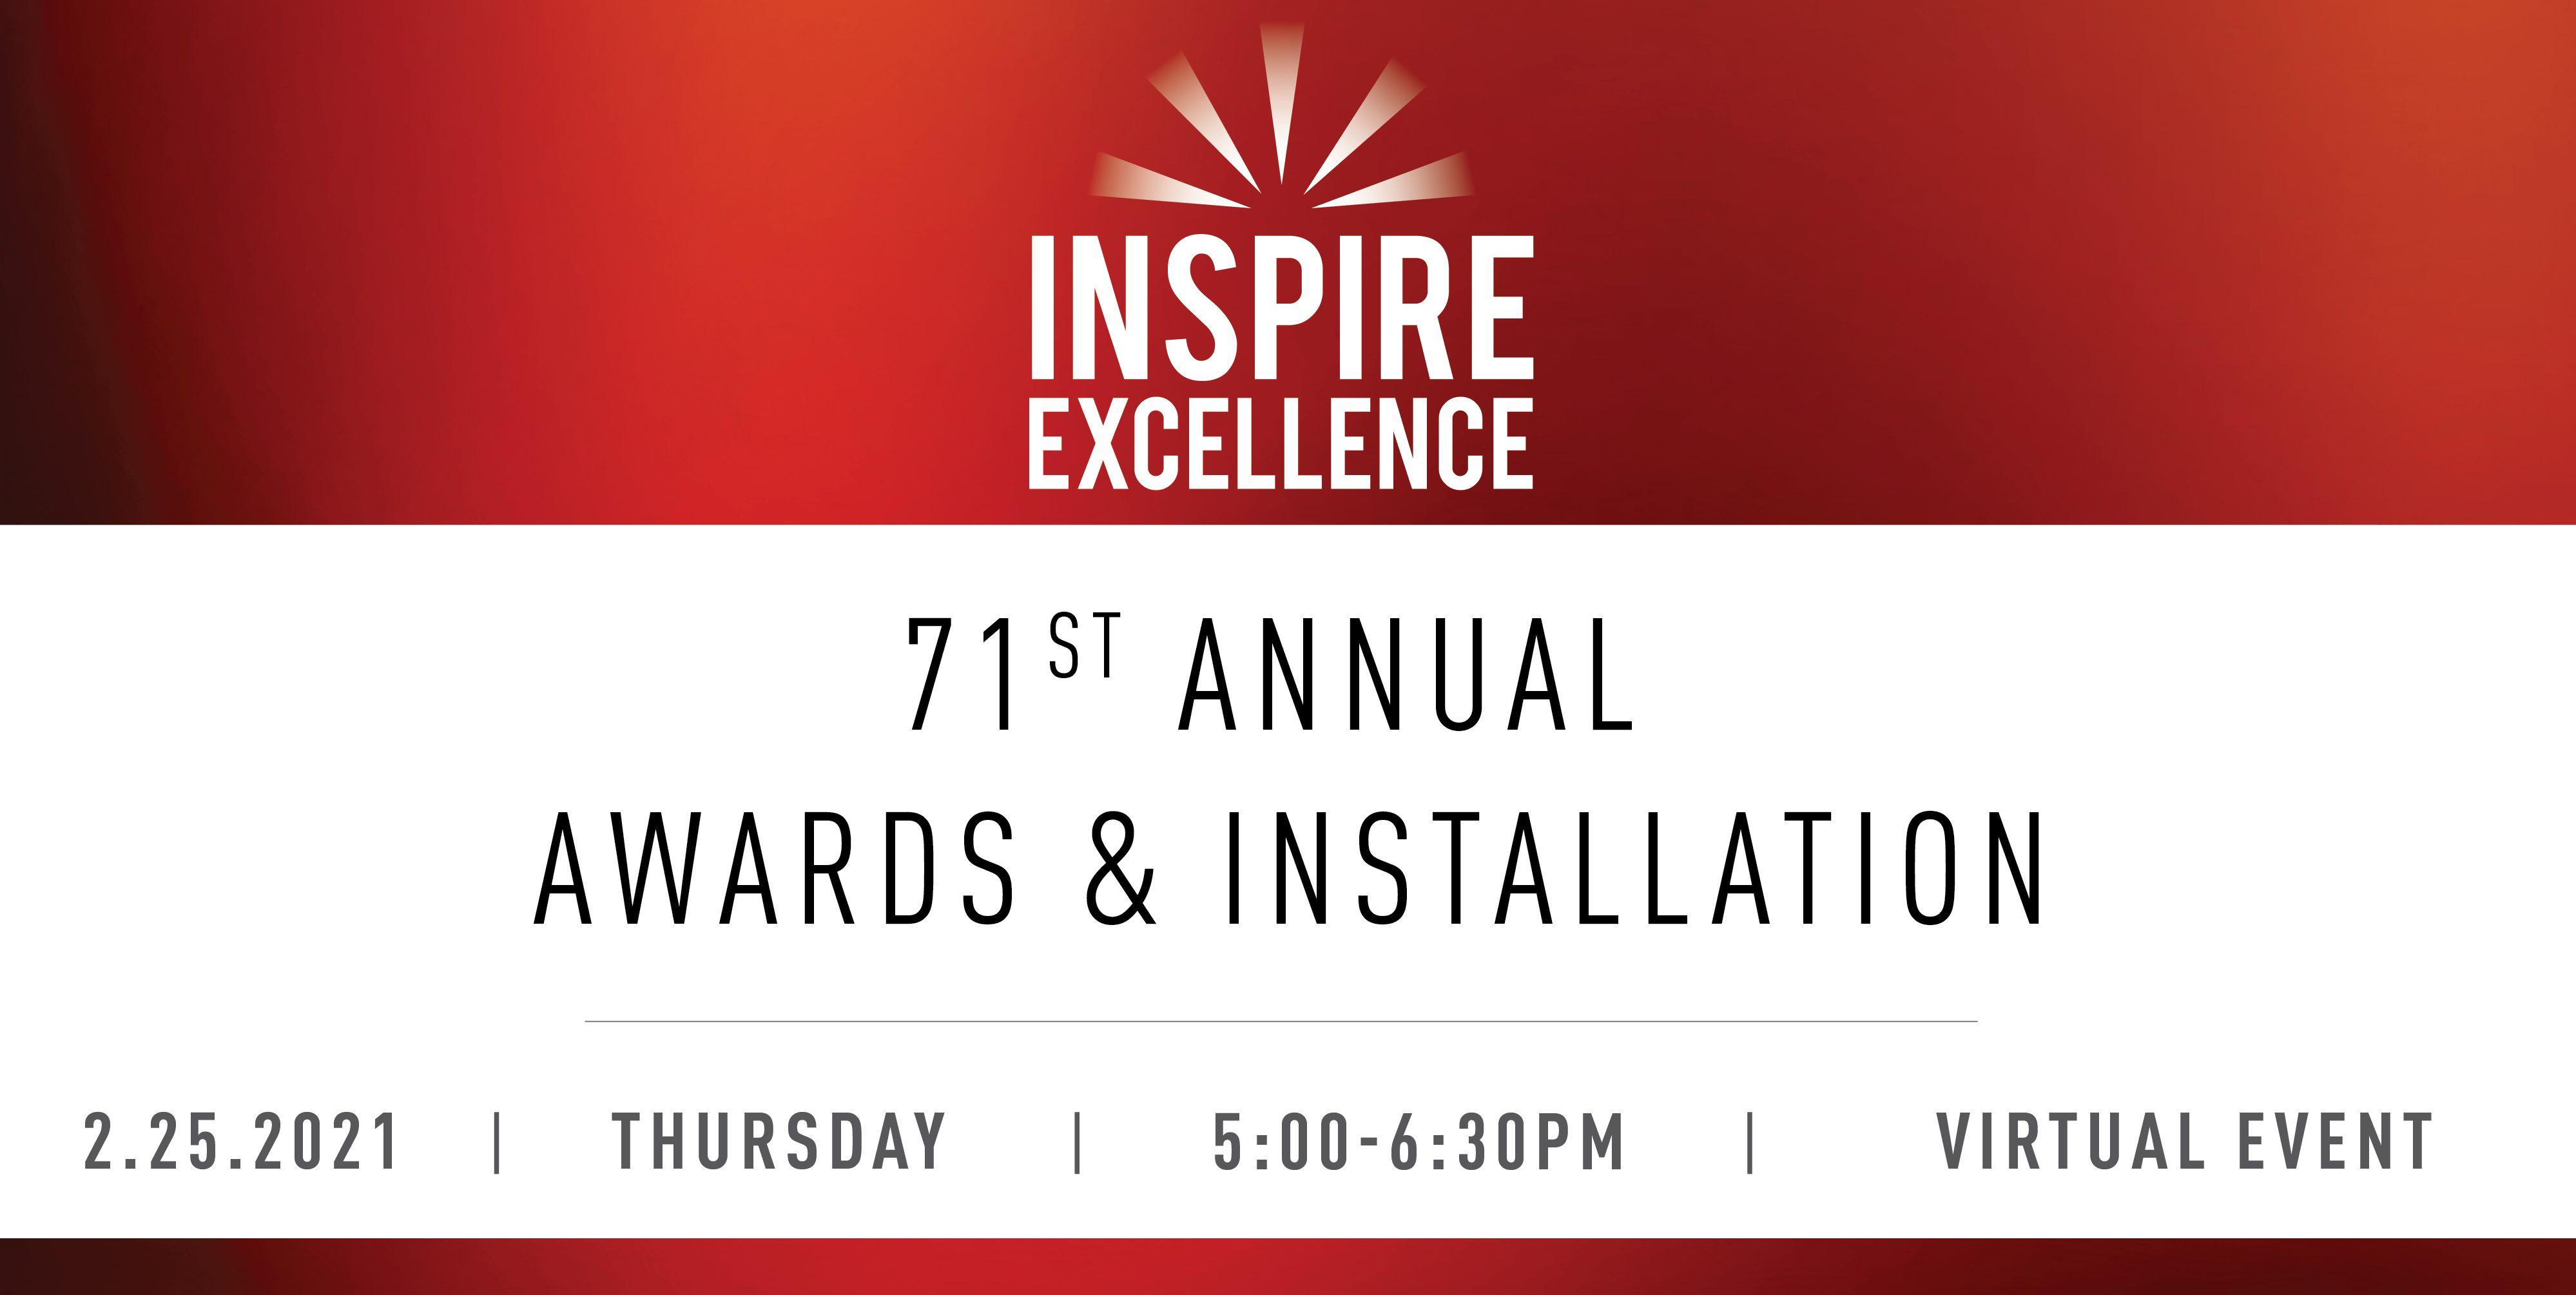 71st Annual Awards & Installation